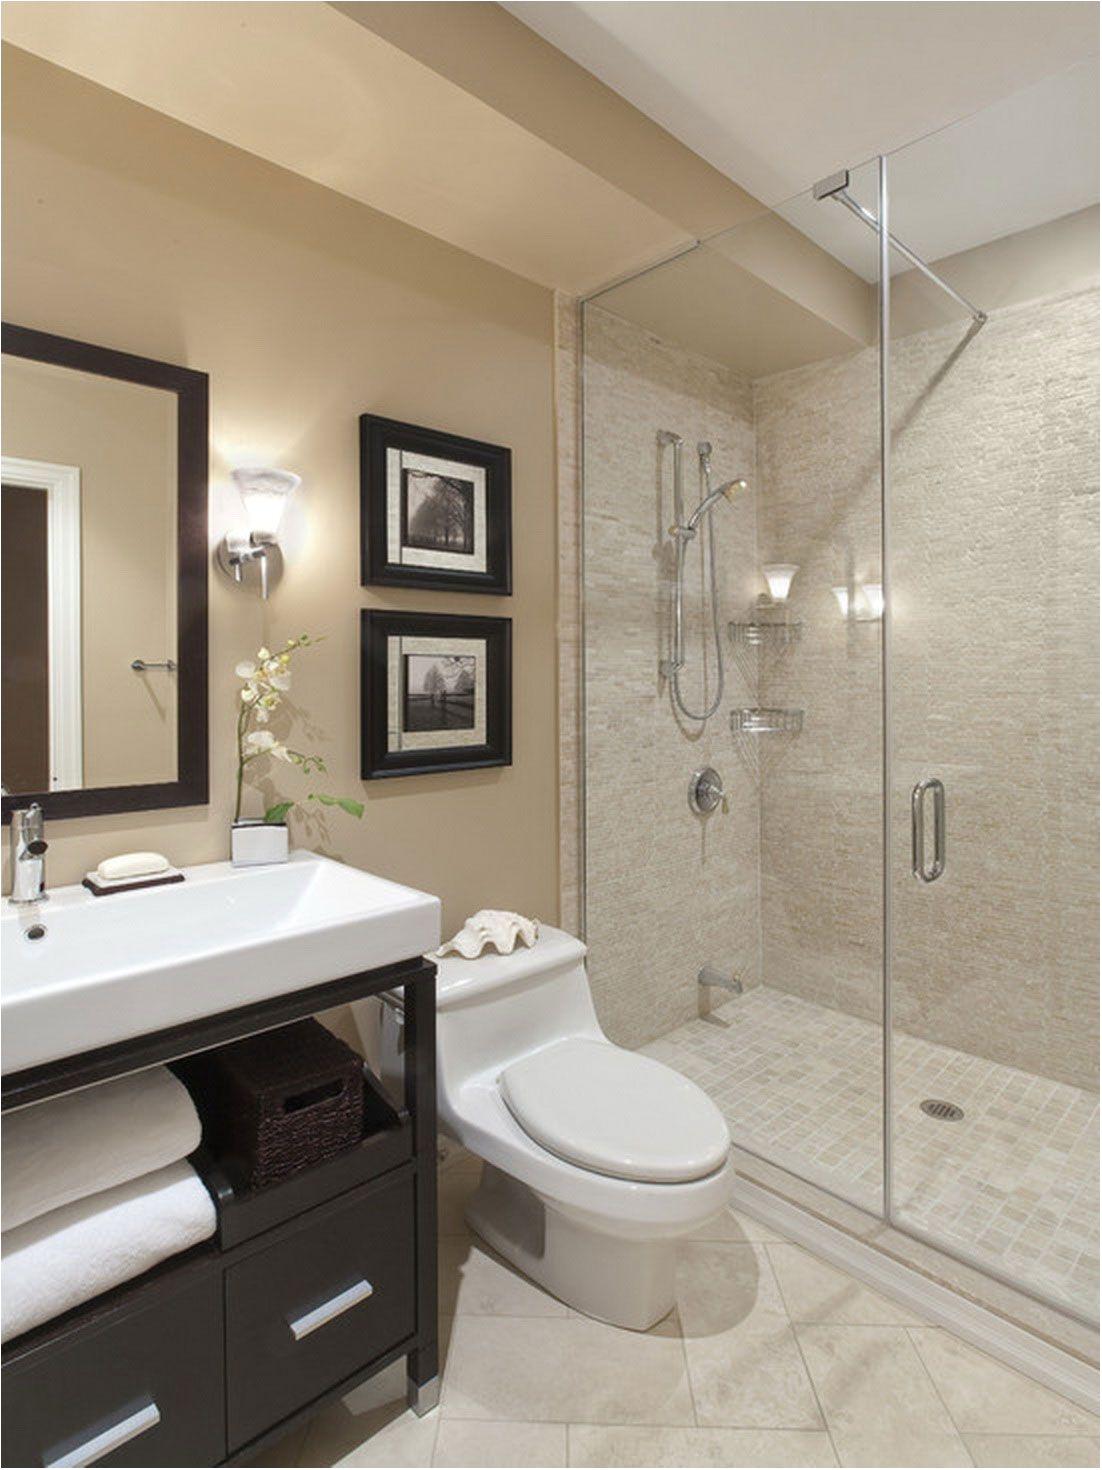 Small Bathroom Design Ideas Dimensions Lovely Best Small Bathroom Design Ideas Dimensions 1857 Luxury Small